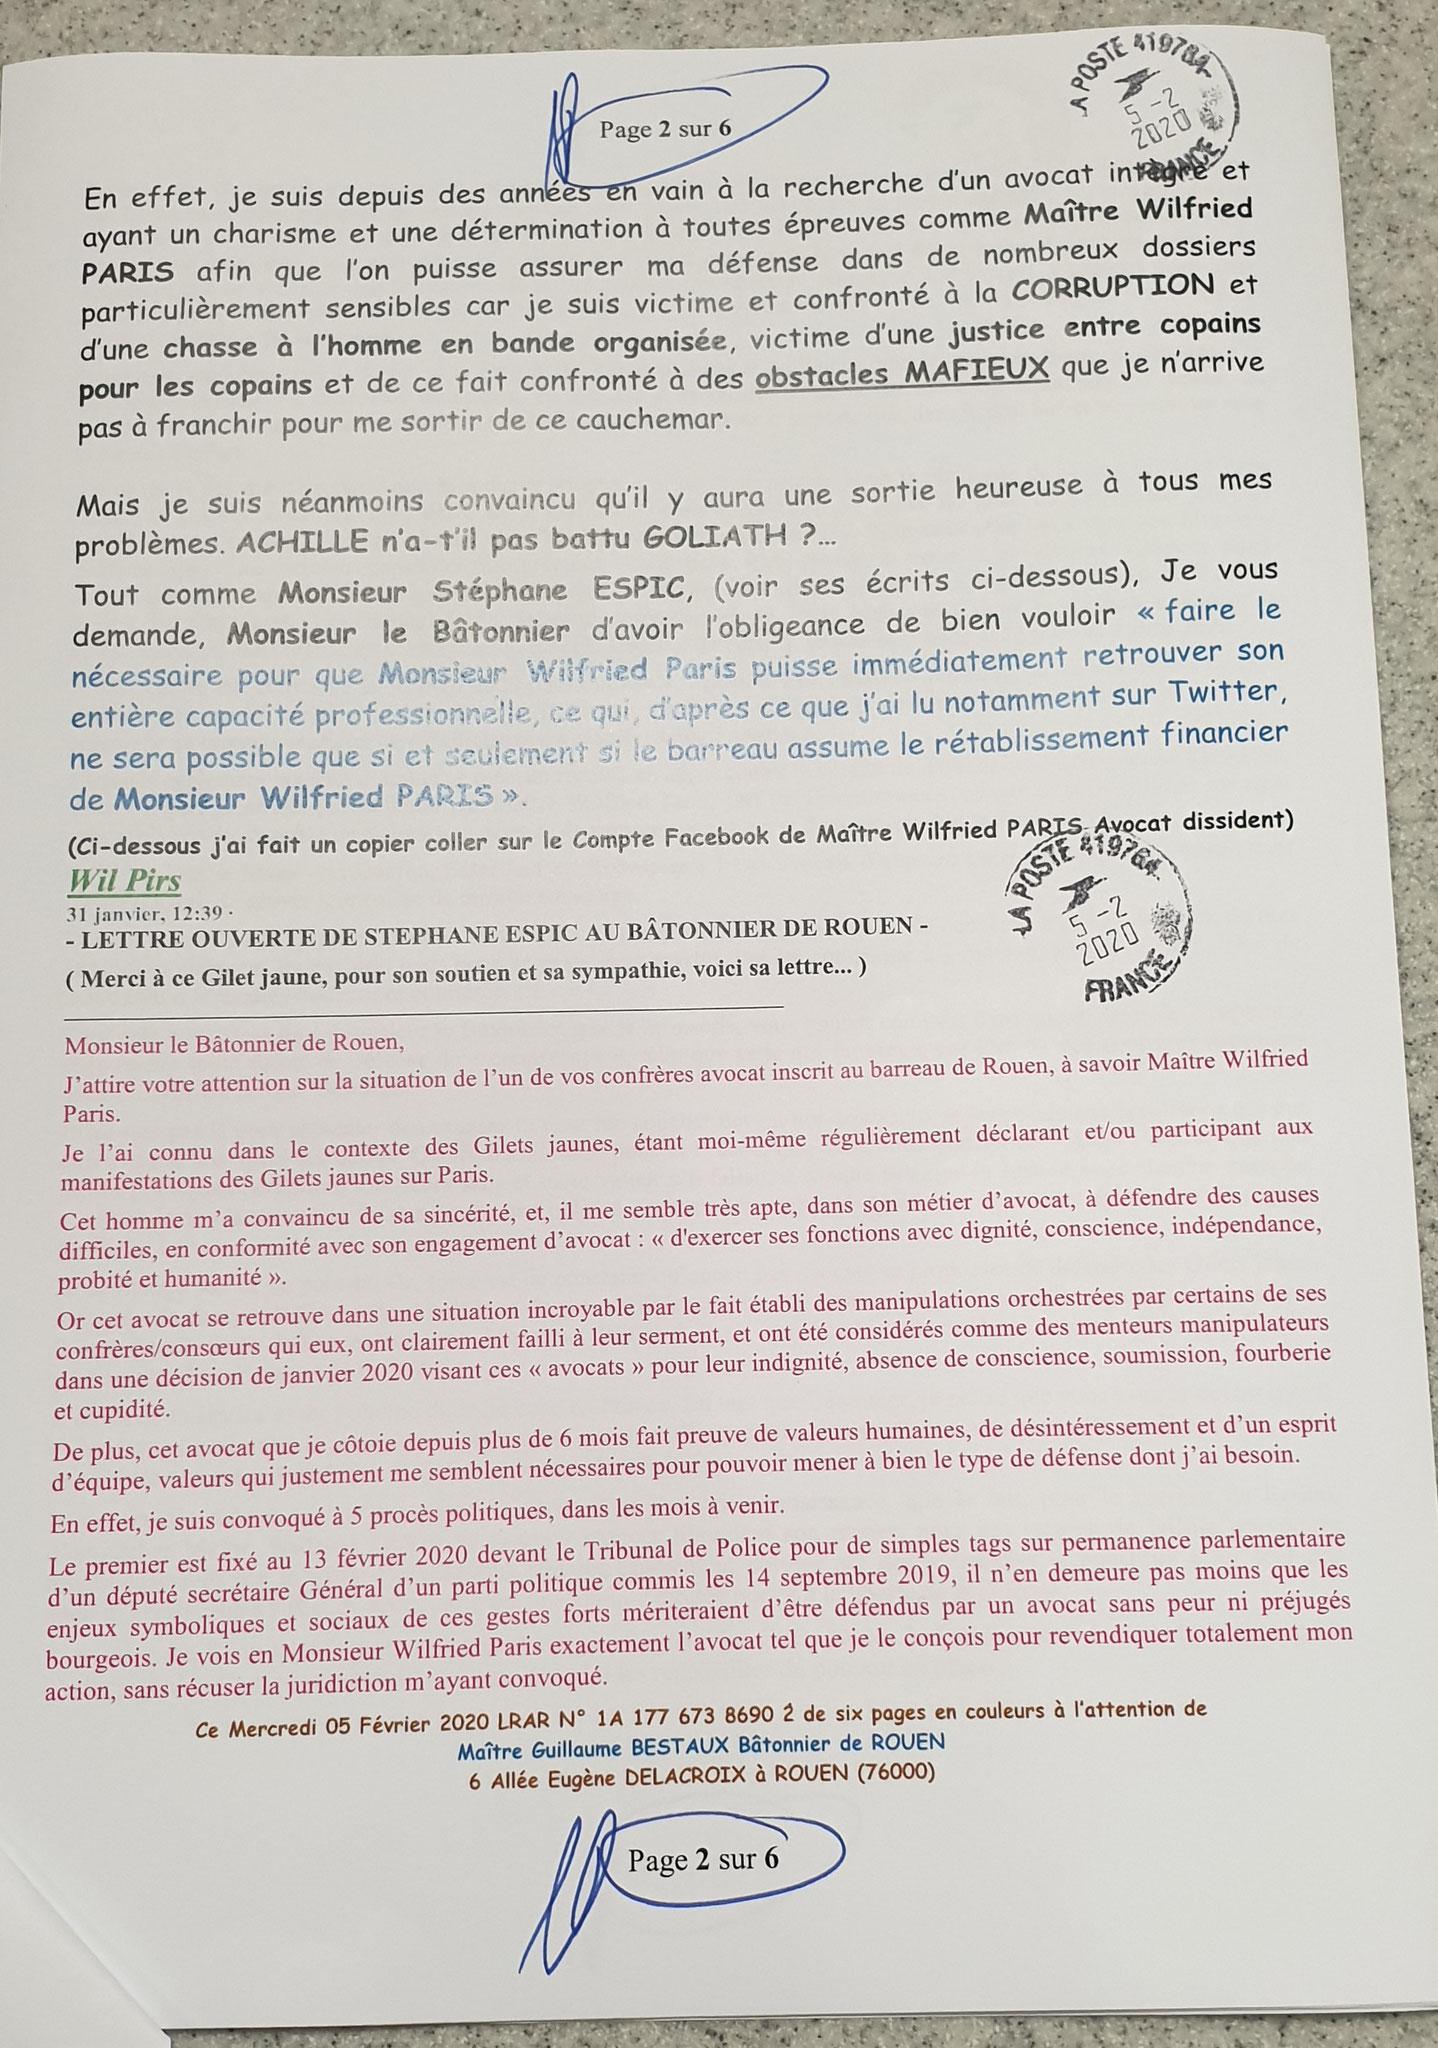 Ma lettre recommandée du 05 Février 2020 N° 1A 177 673 8690 2 Page 2 sur 6 en couleurs www.jesuispatrick.fr www.jesuisvictime.fr www.alerte-rouge-france.fr